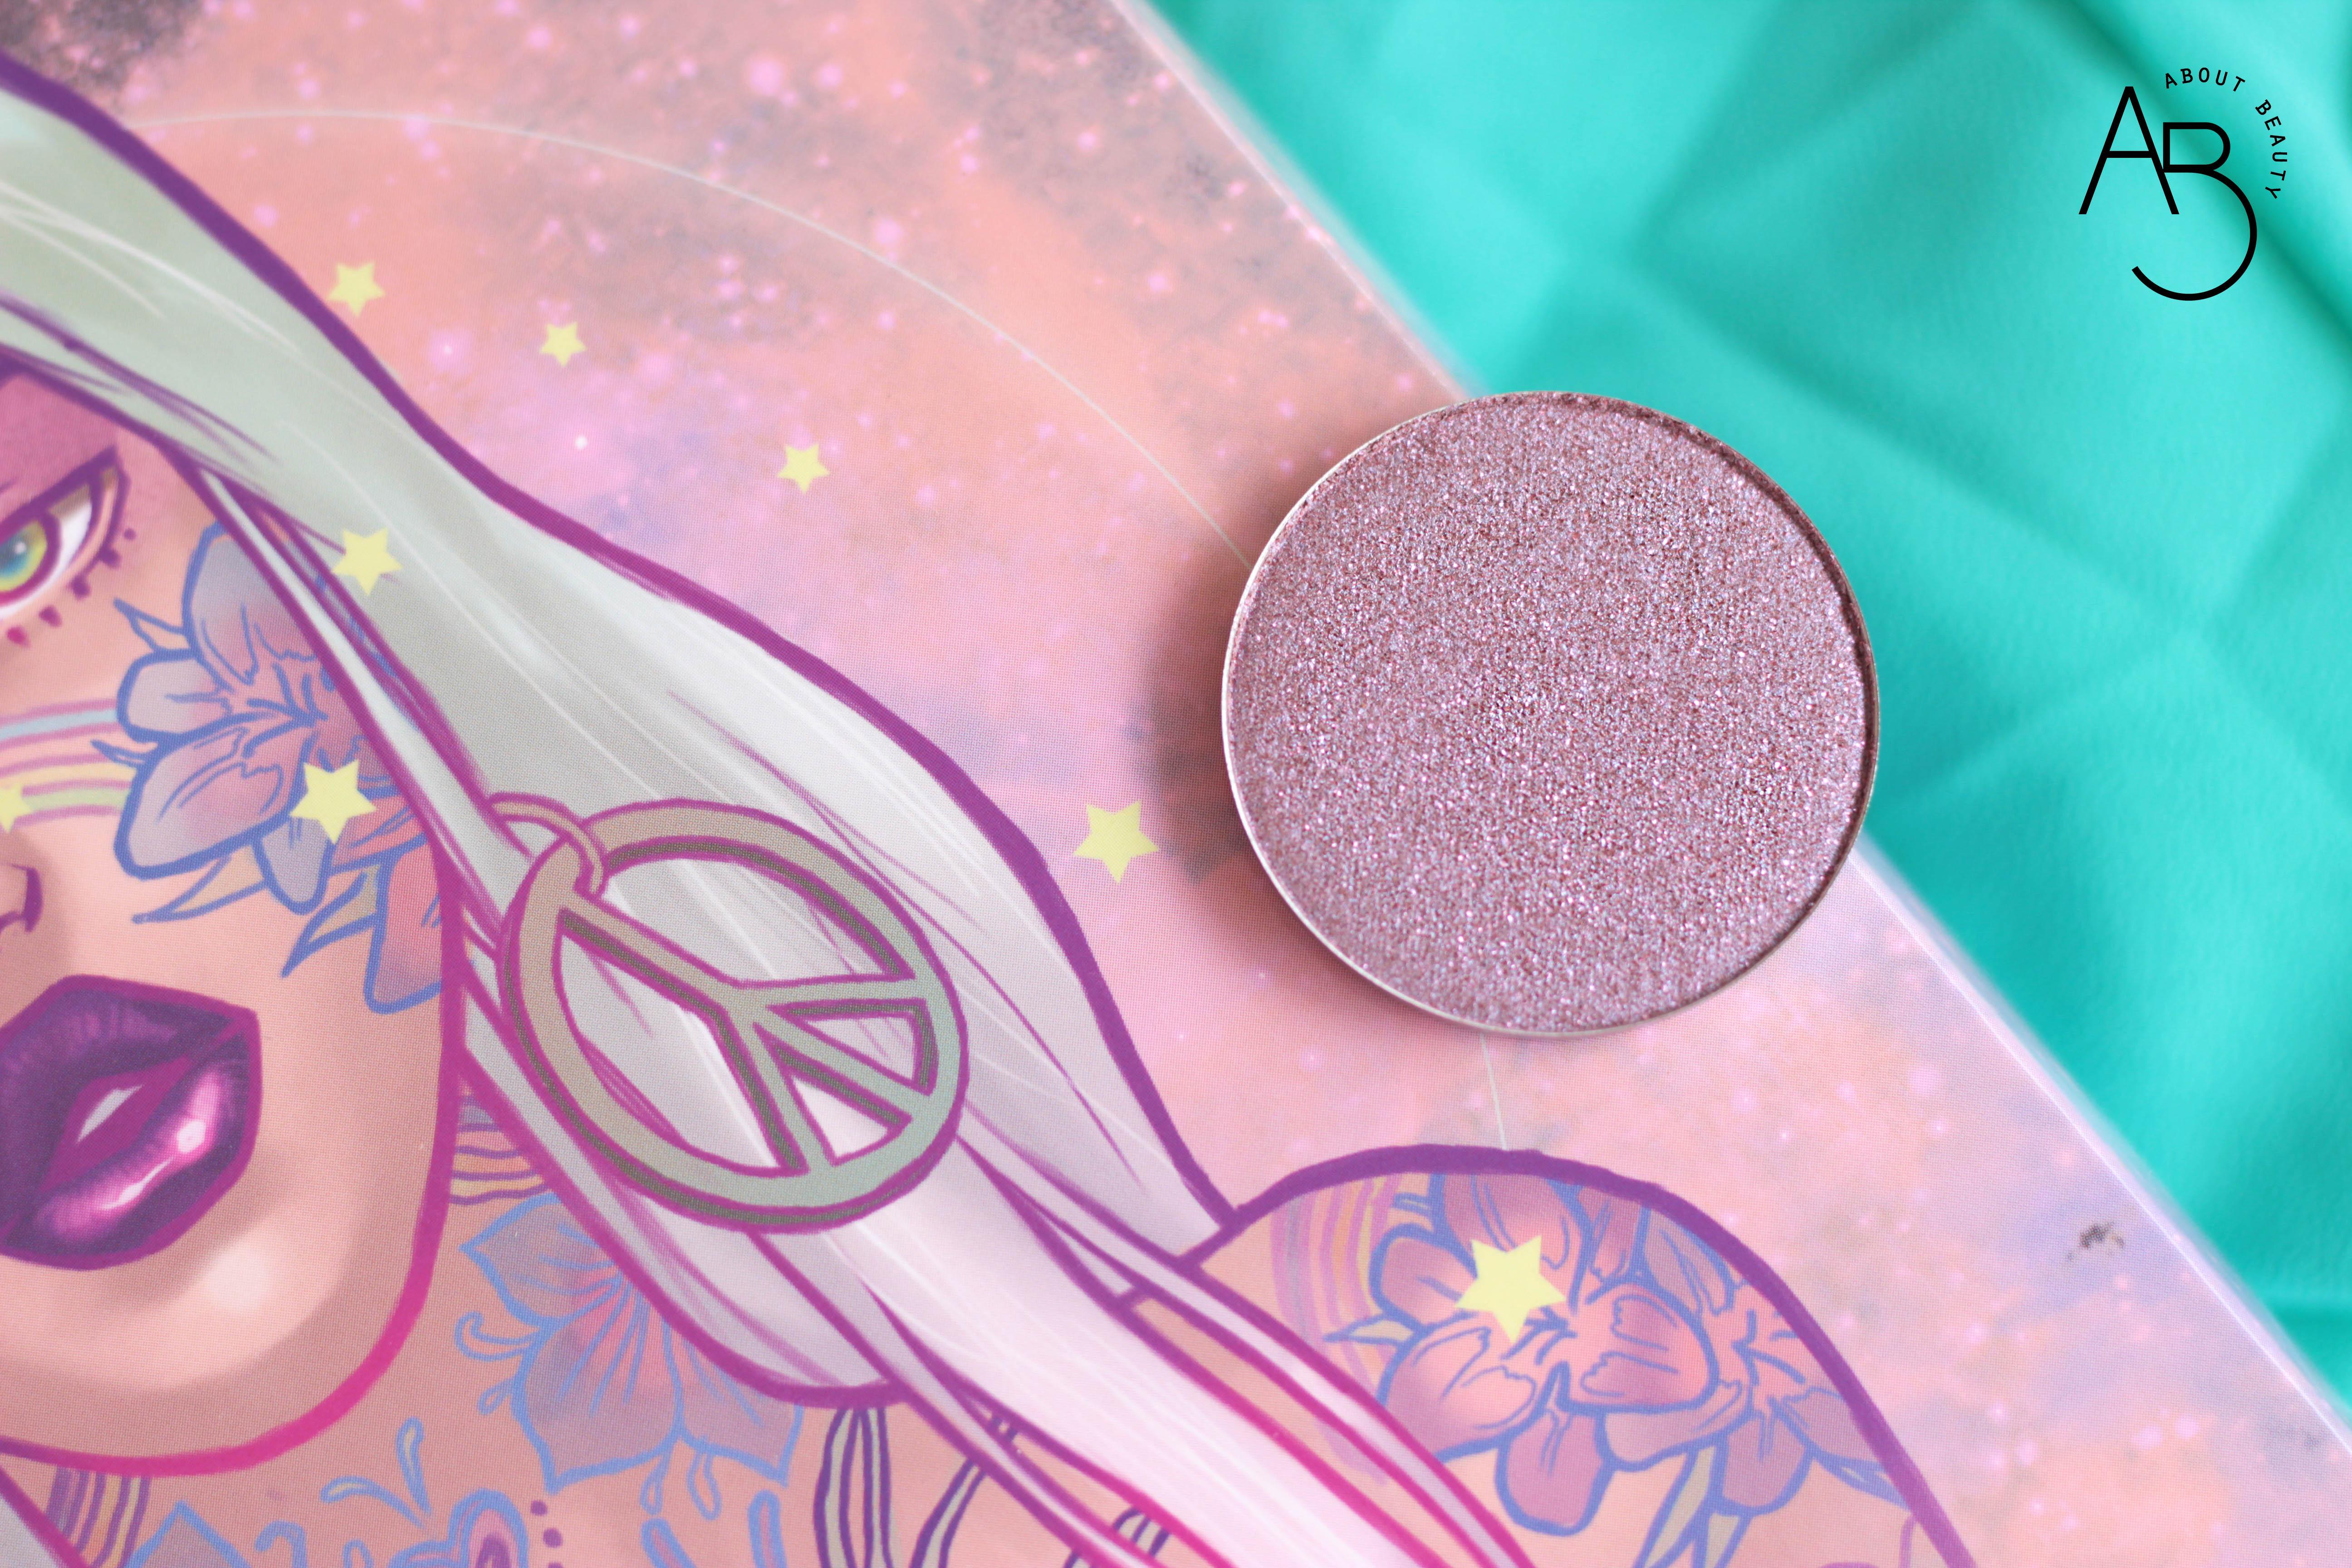 Neve Cosmetics Sparkling '67 - Info review recensione prezzo sconto swatch - Tie-dye